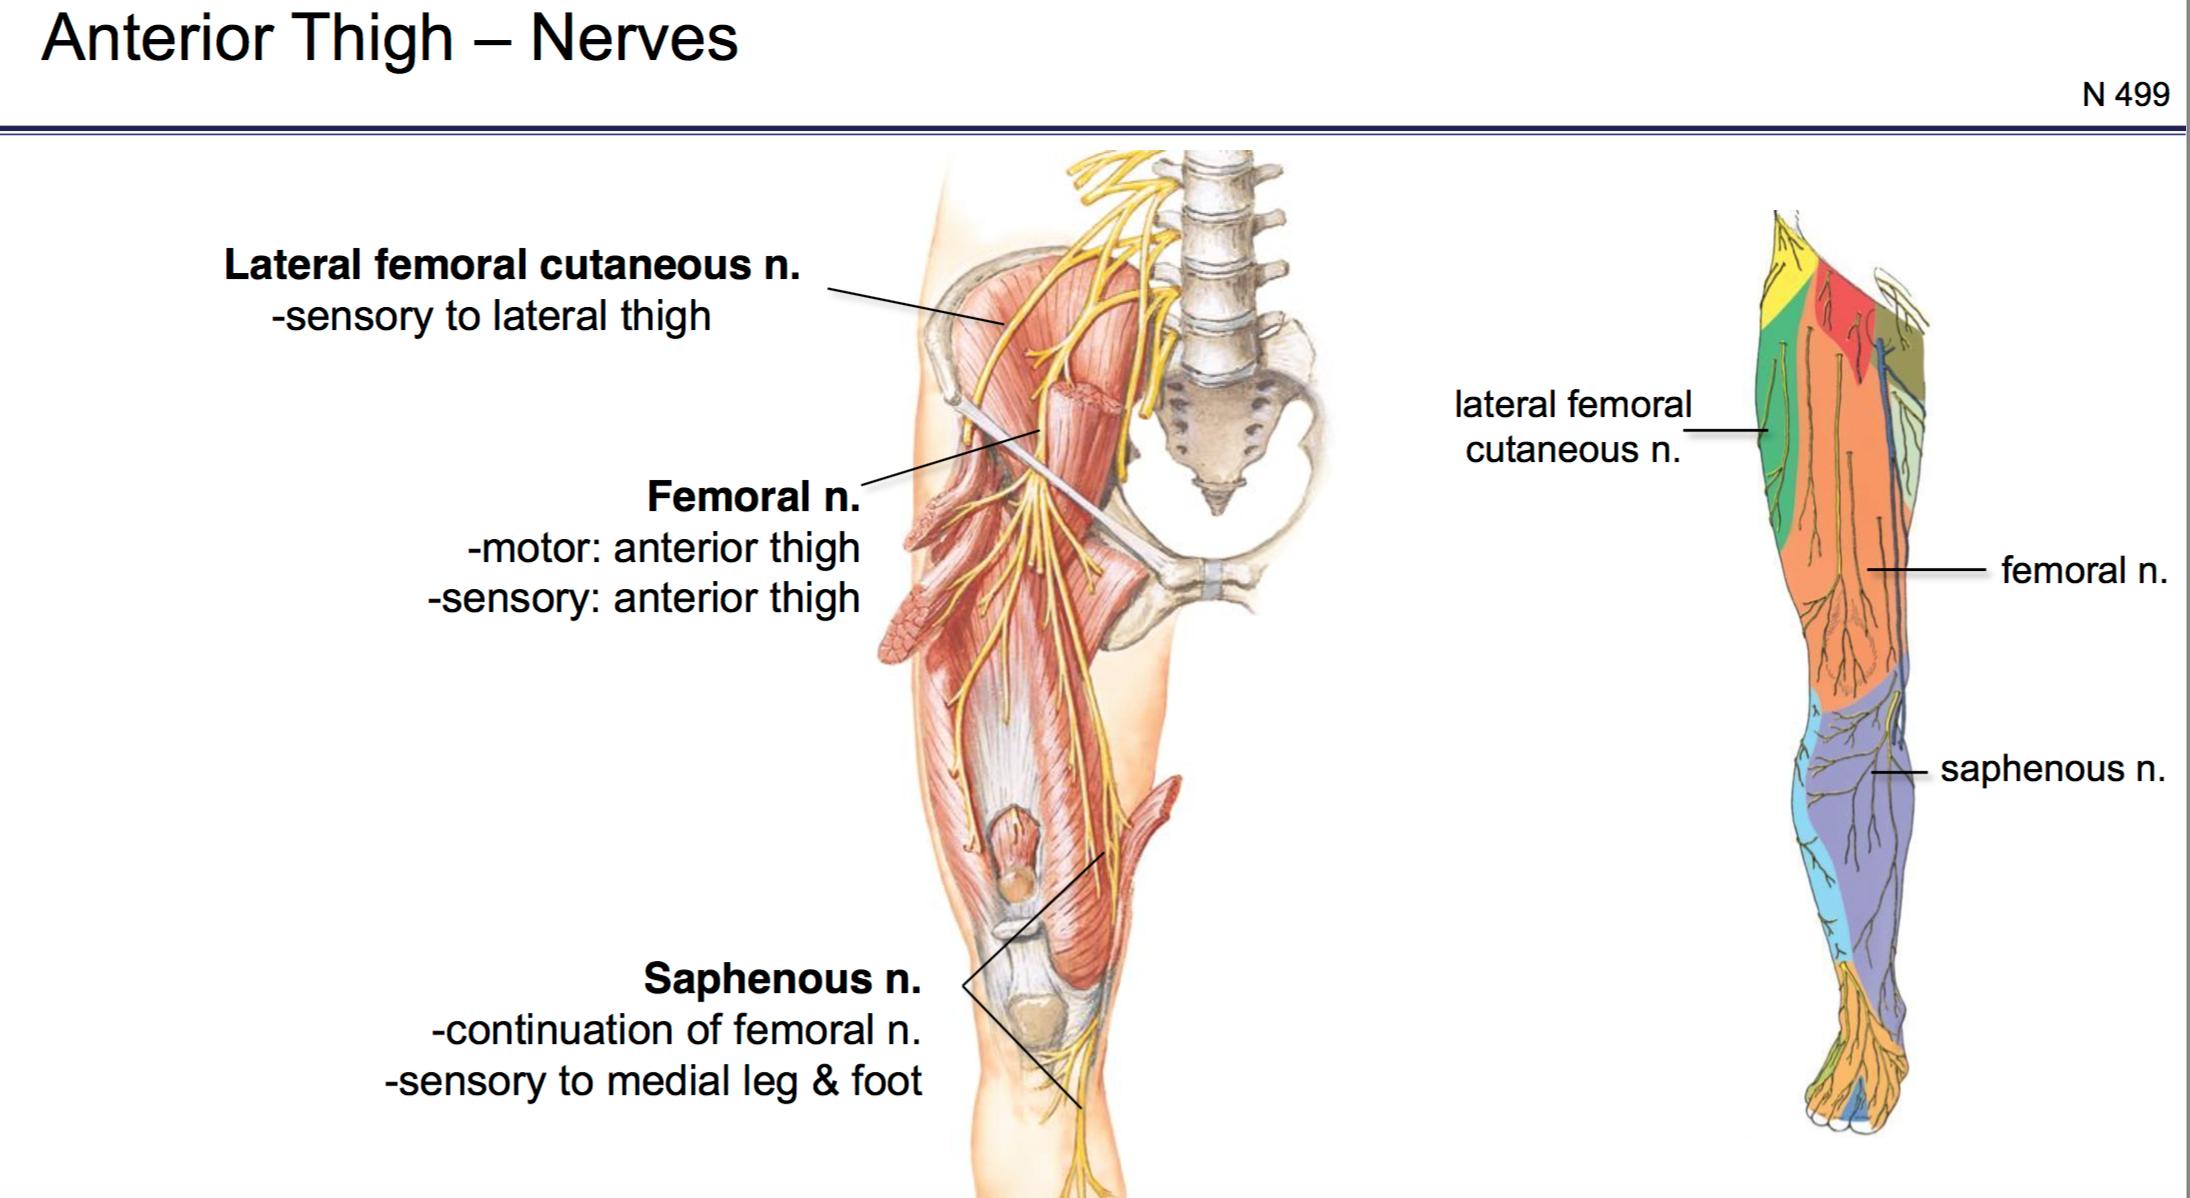 FG Anatomy G44 Anterior and Medial Thigh Part 2 (Anatomy Unit 6 ...